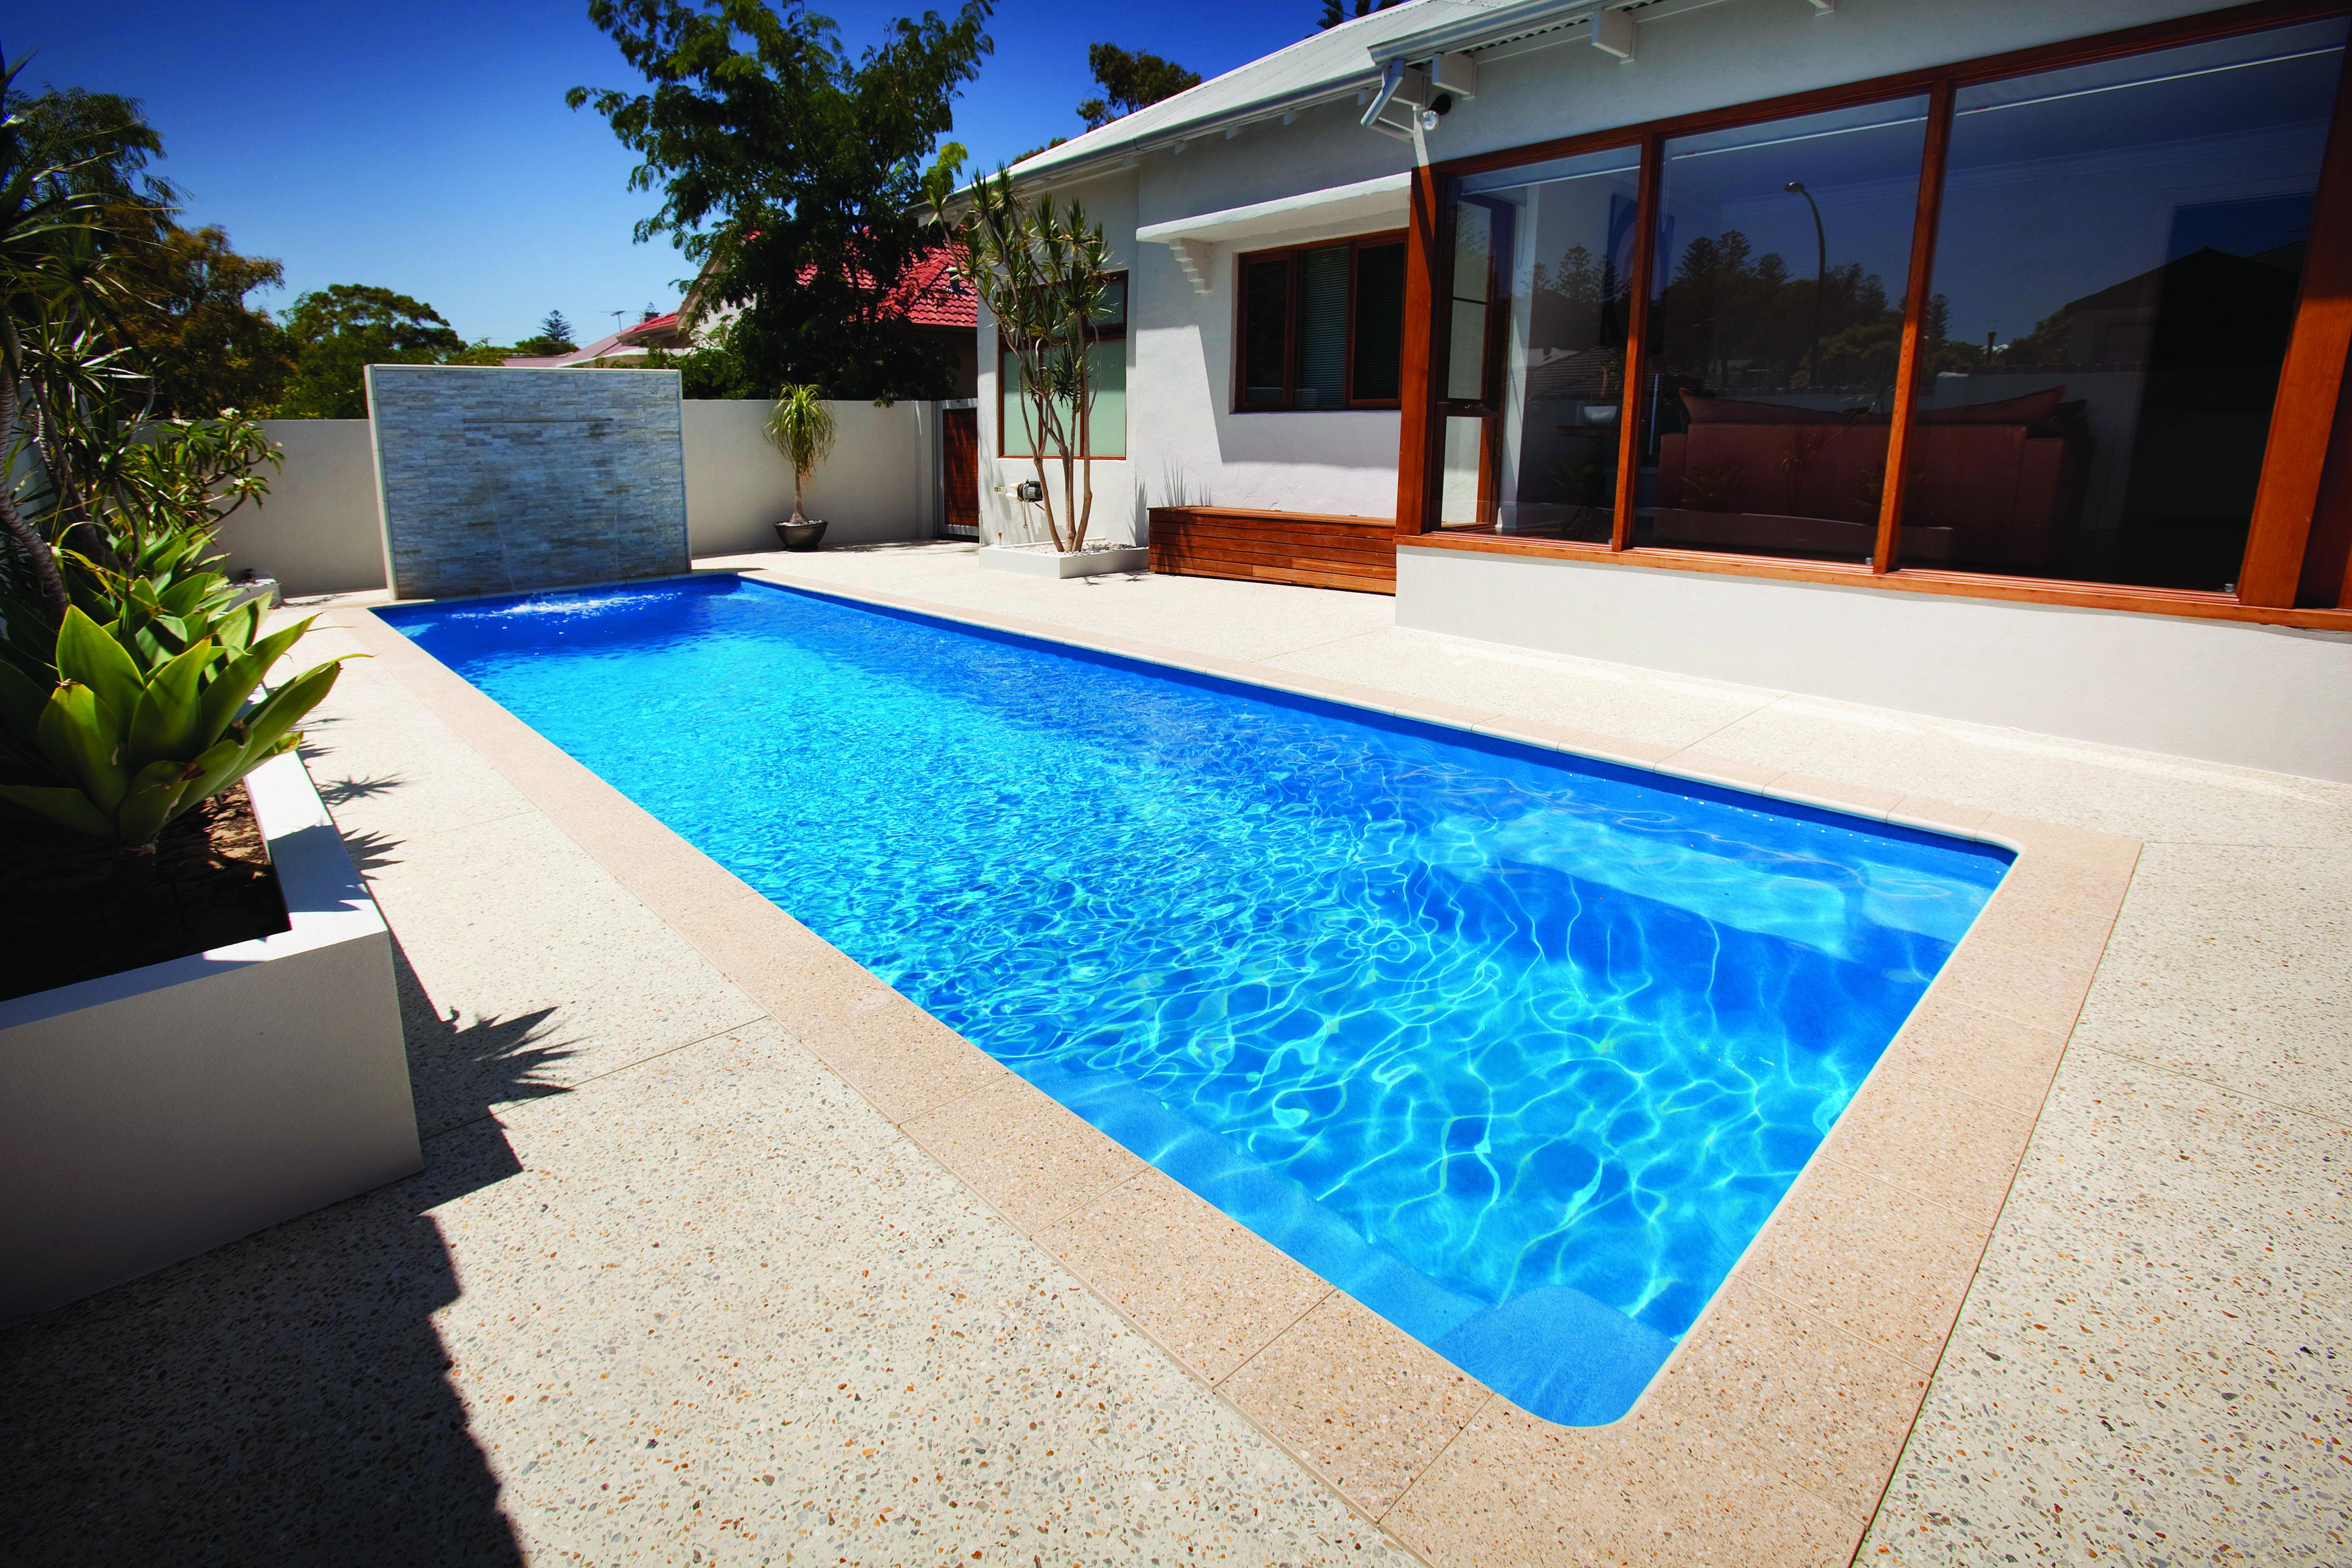 Milan Silver Spasa Wa Fibreglass Pools Swimming Pool Photos Endless Pool Spa Endless Pool